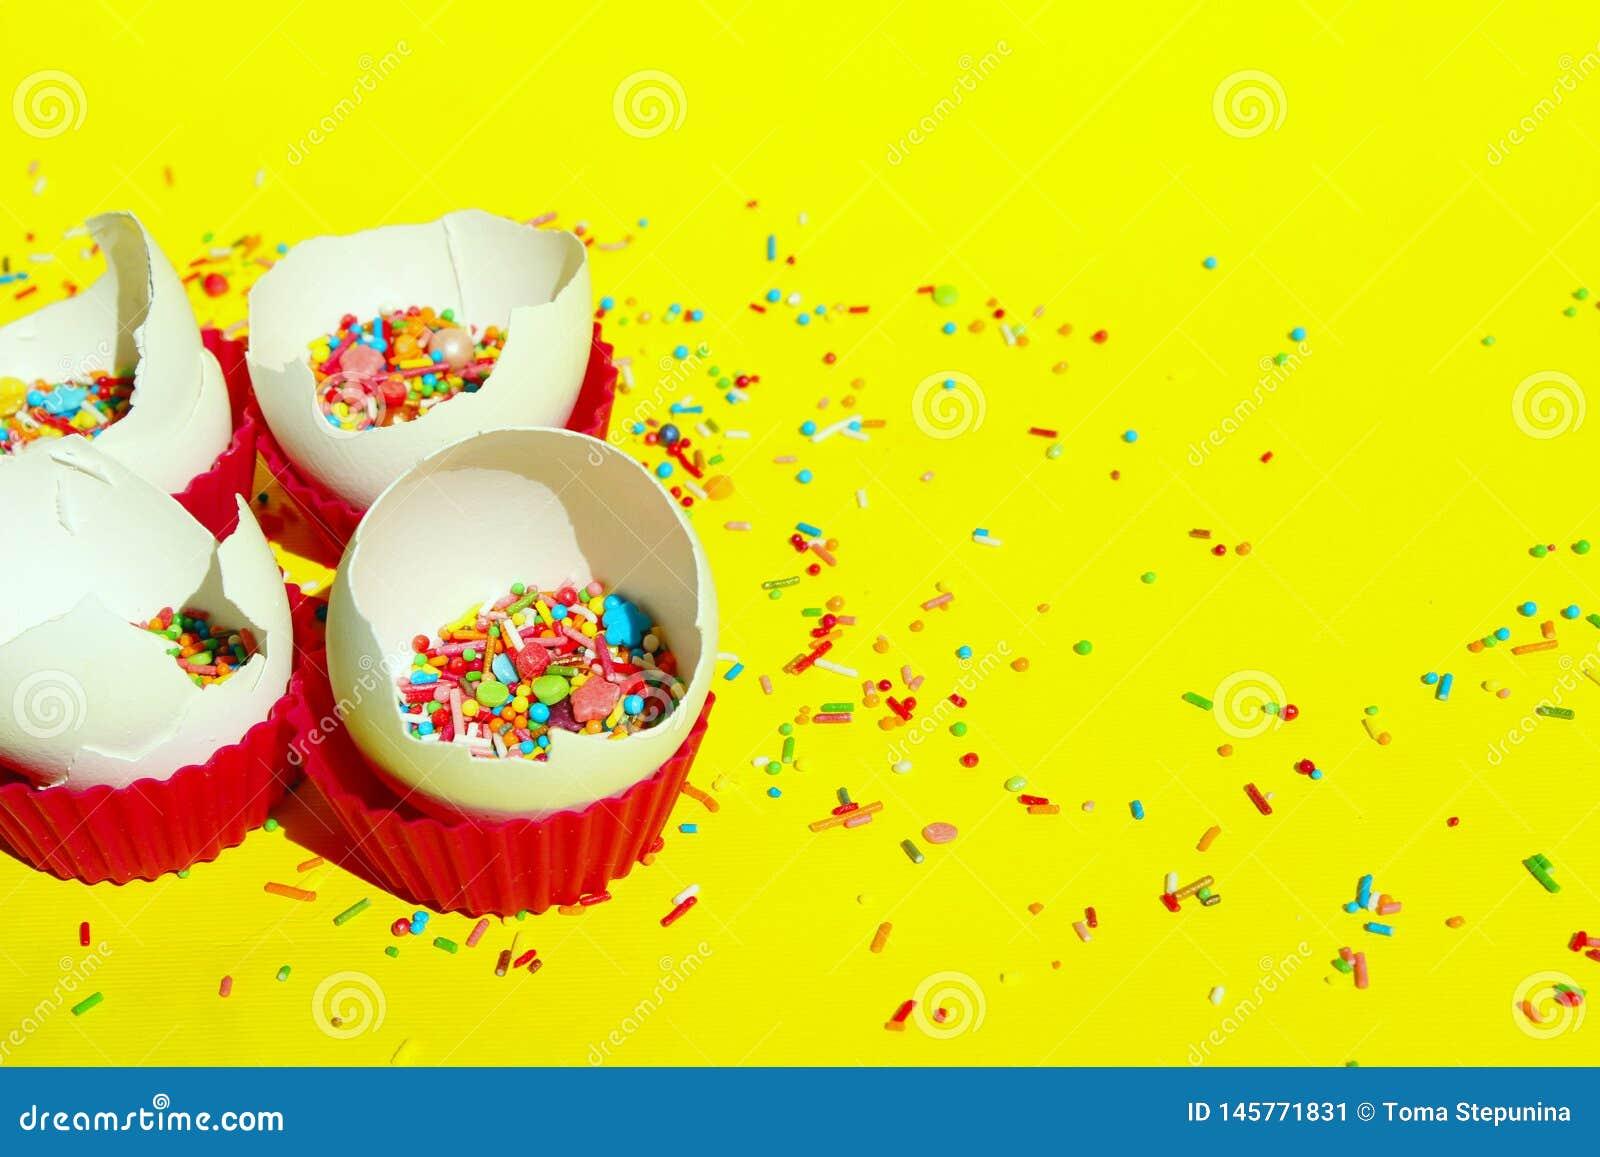 Minimal Art Design. Desserts, Holidays, Birthday Concept. Broken Eggs And Colorful Candies.